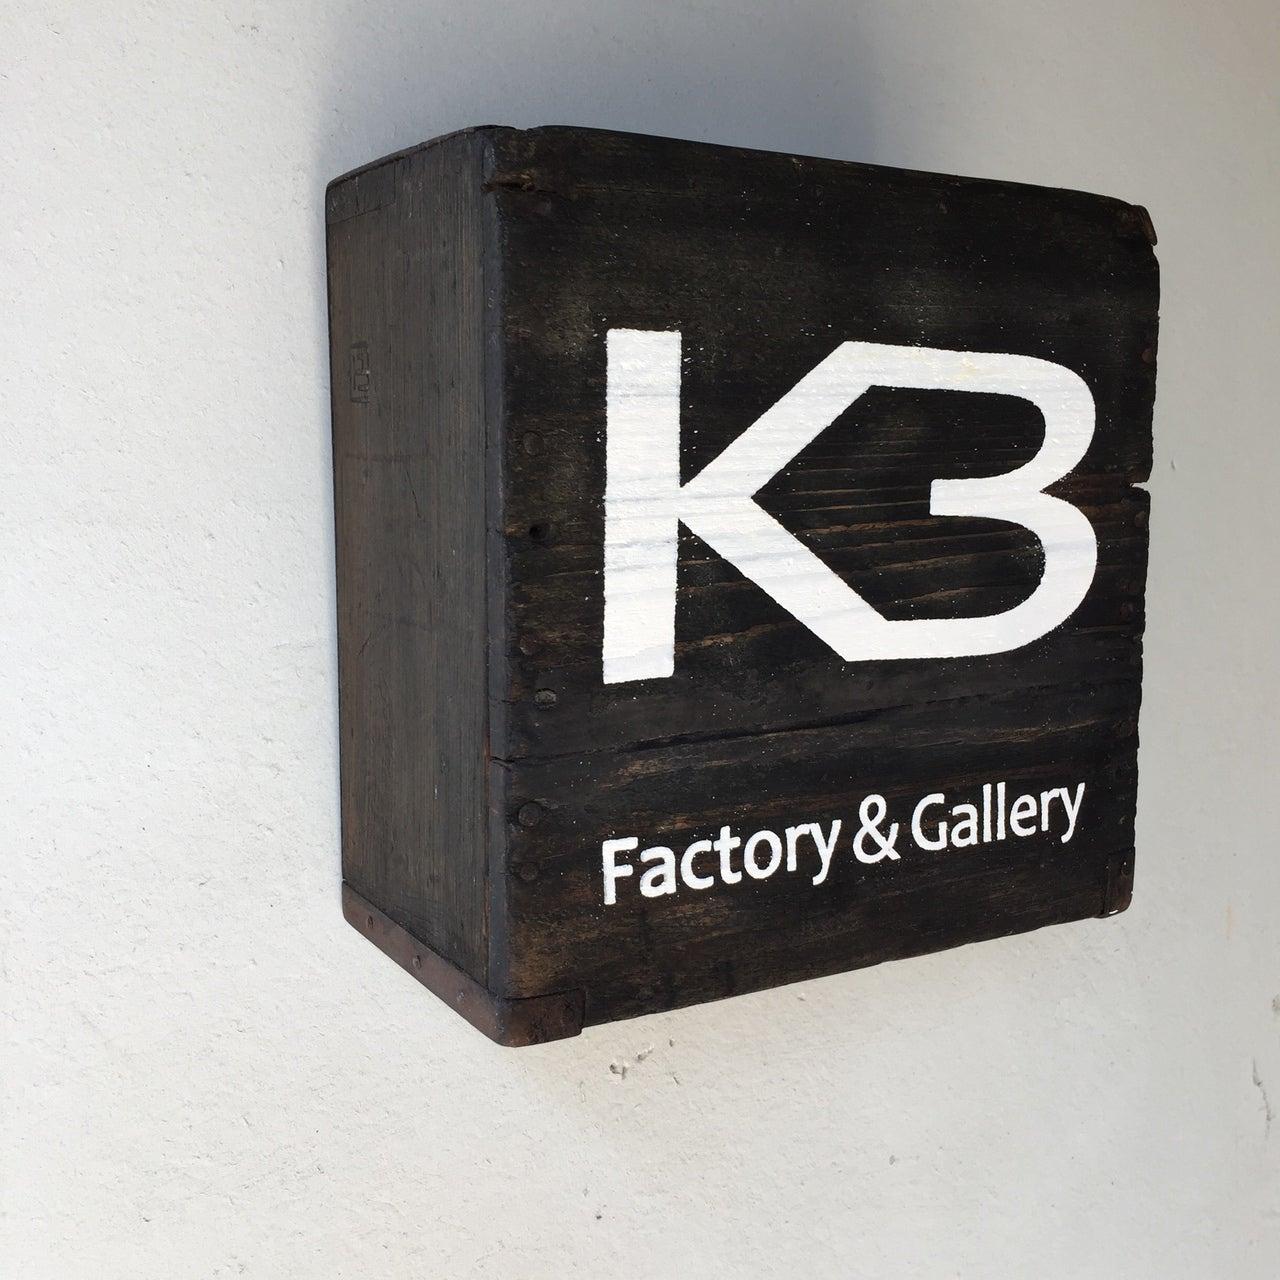 K3factory & gallery